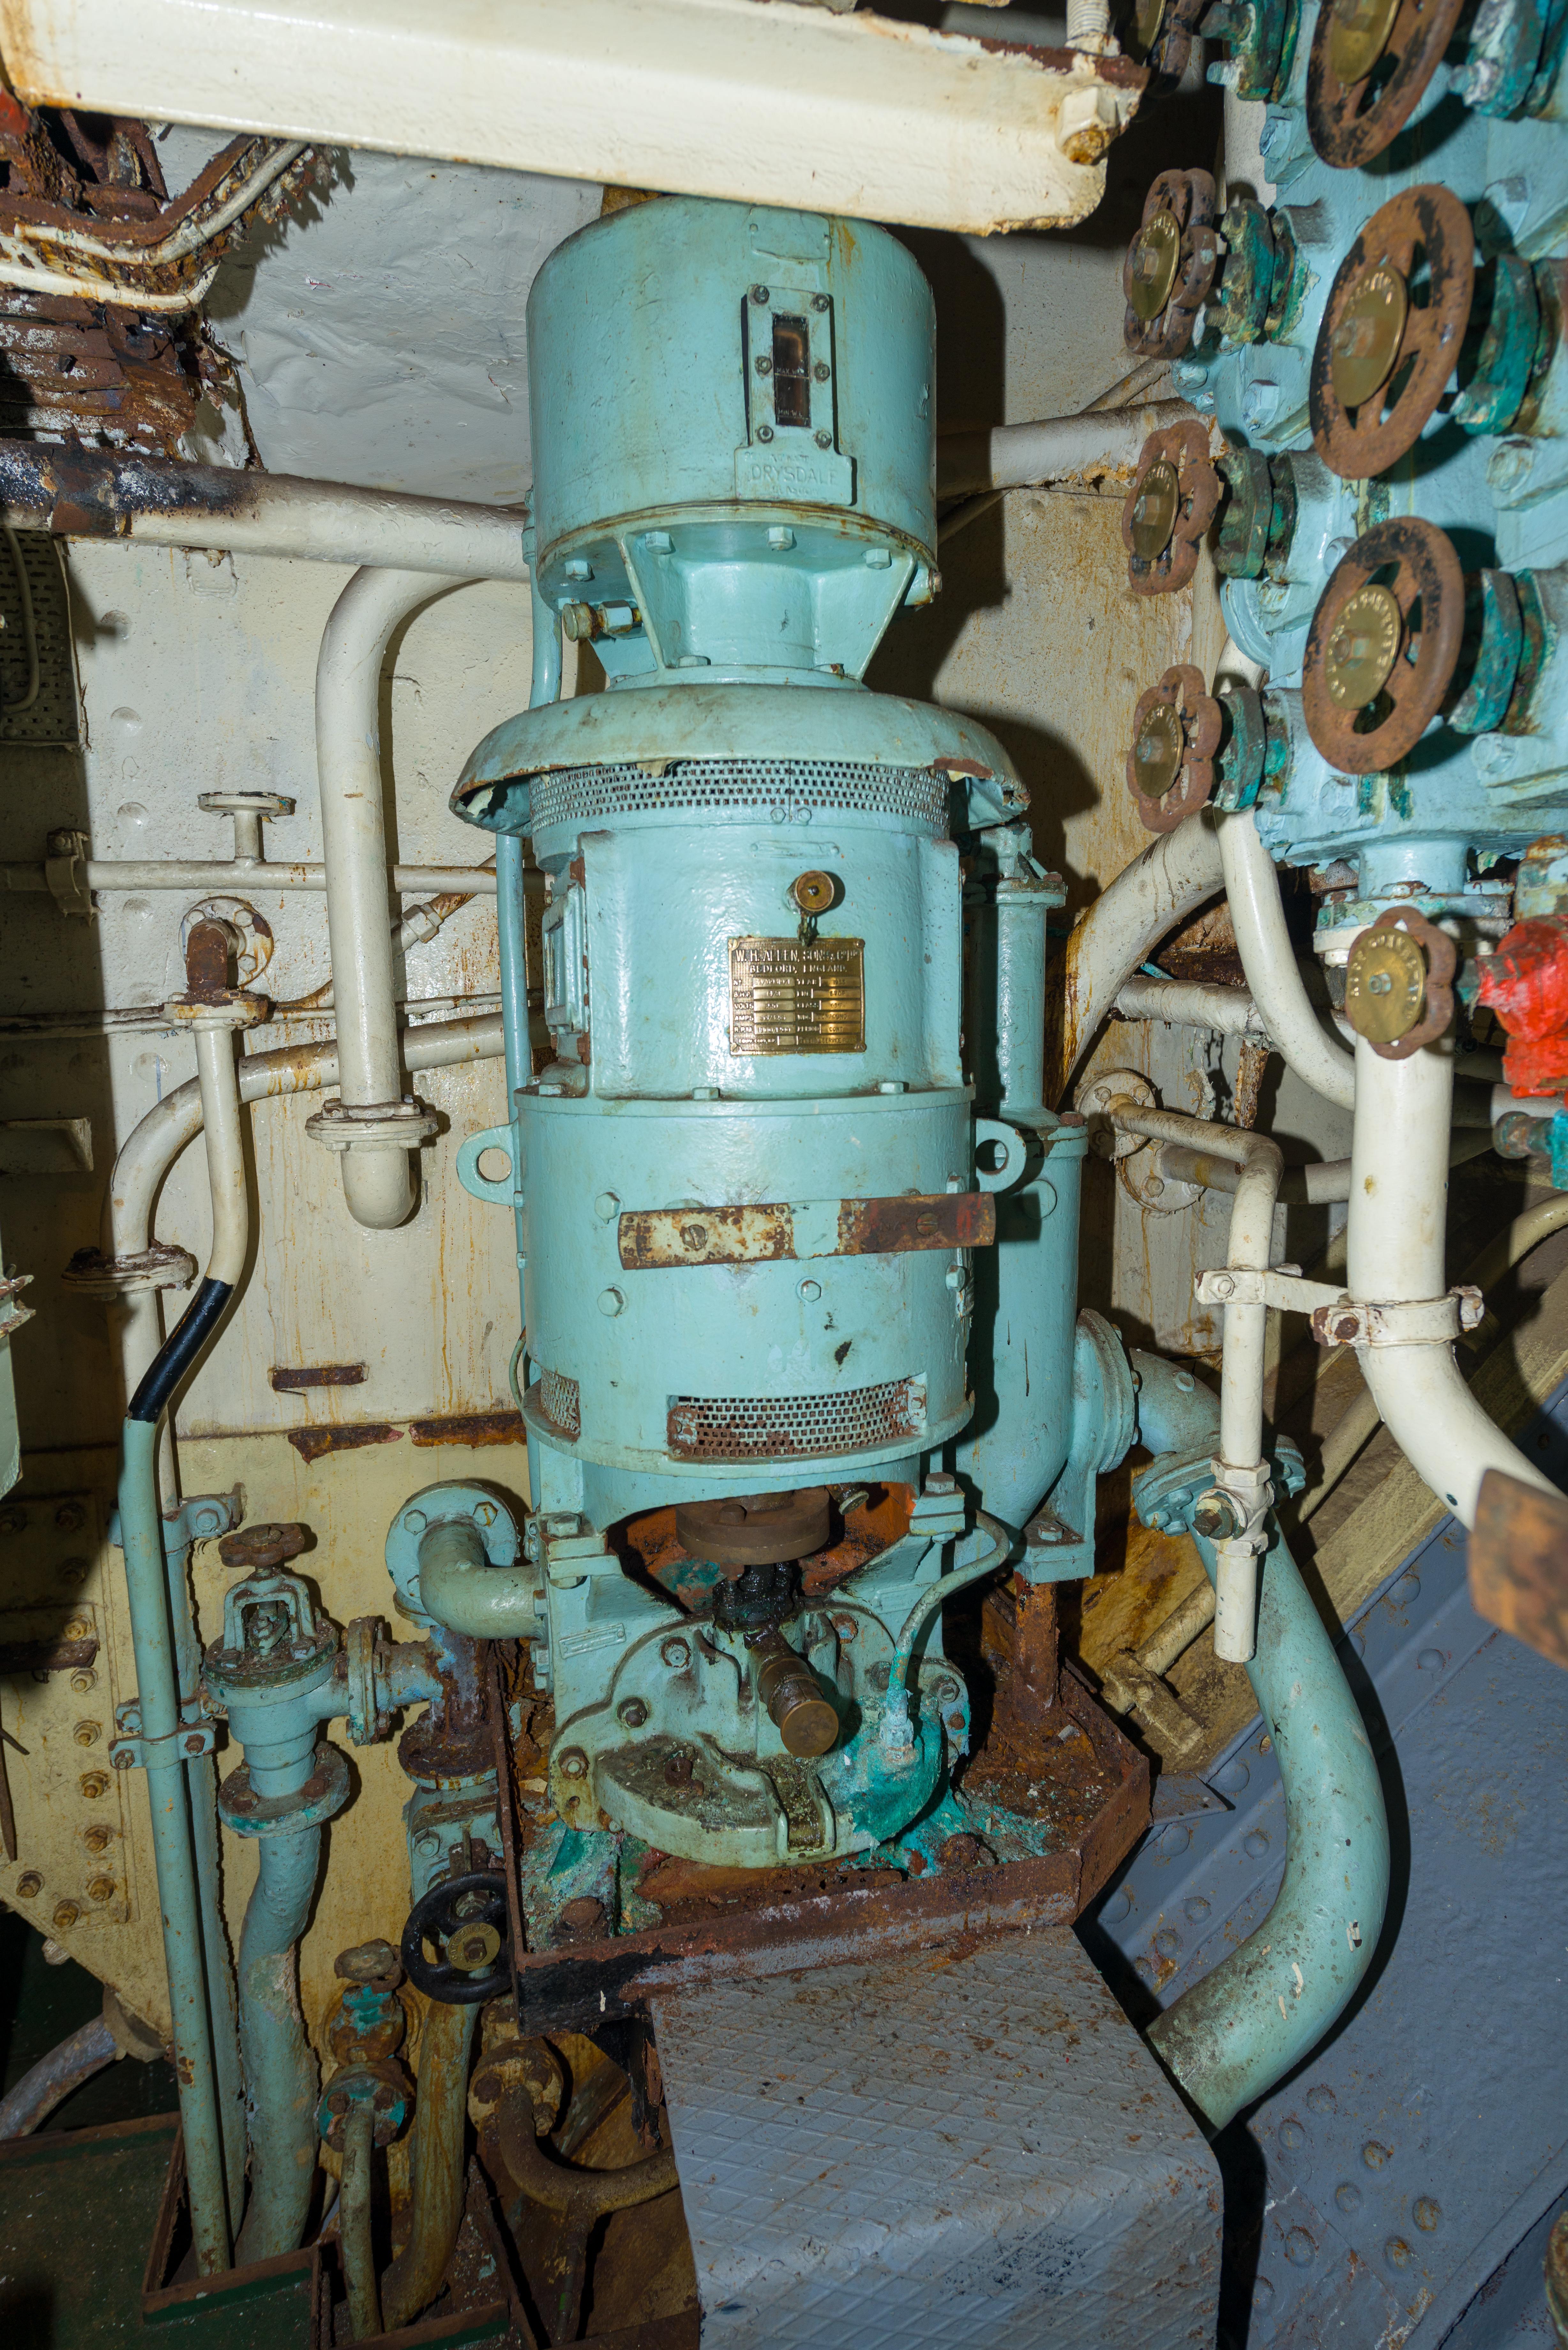 SS Explorer Aft General Service Pump